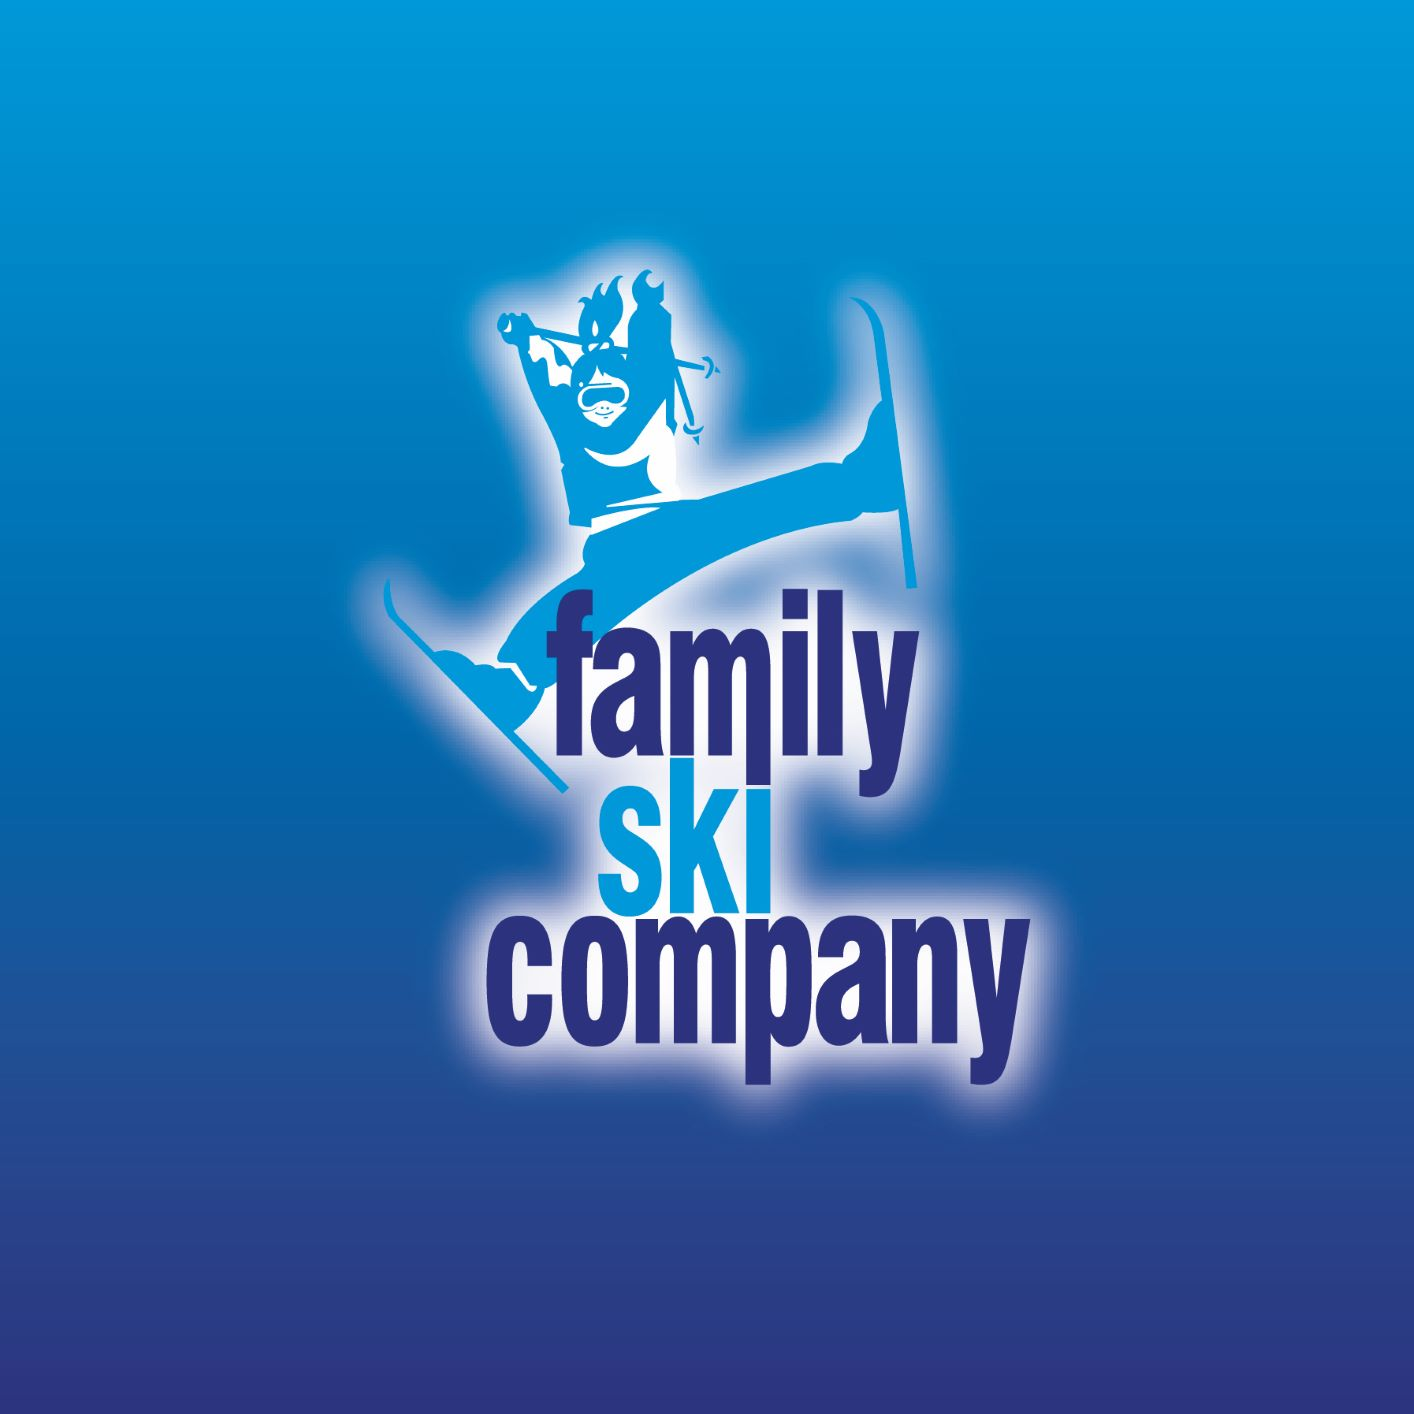 Family Ski Company Ltd